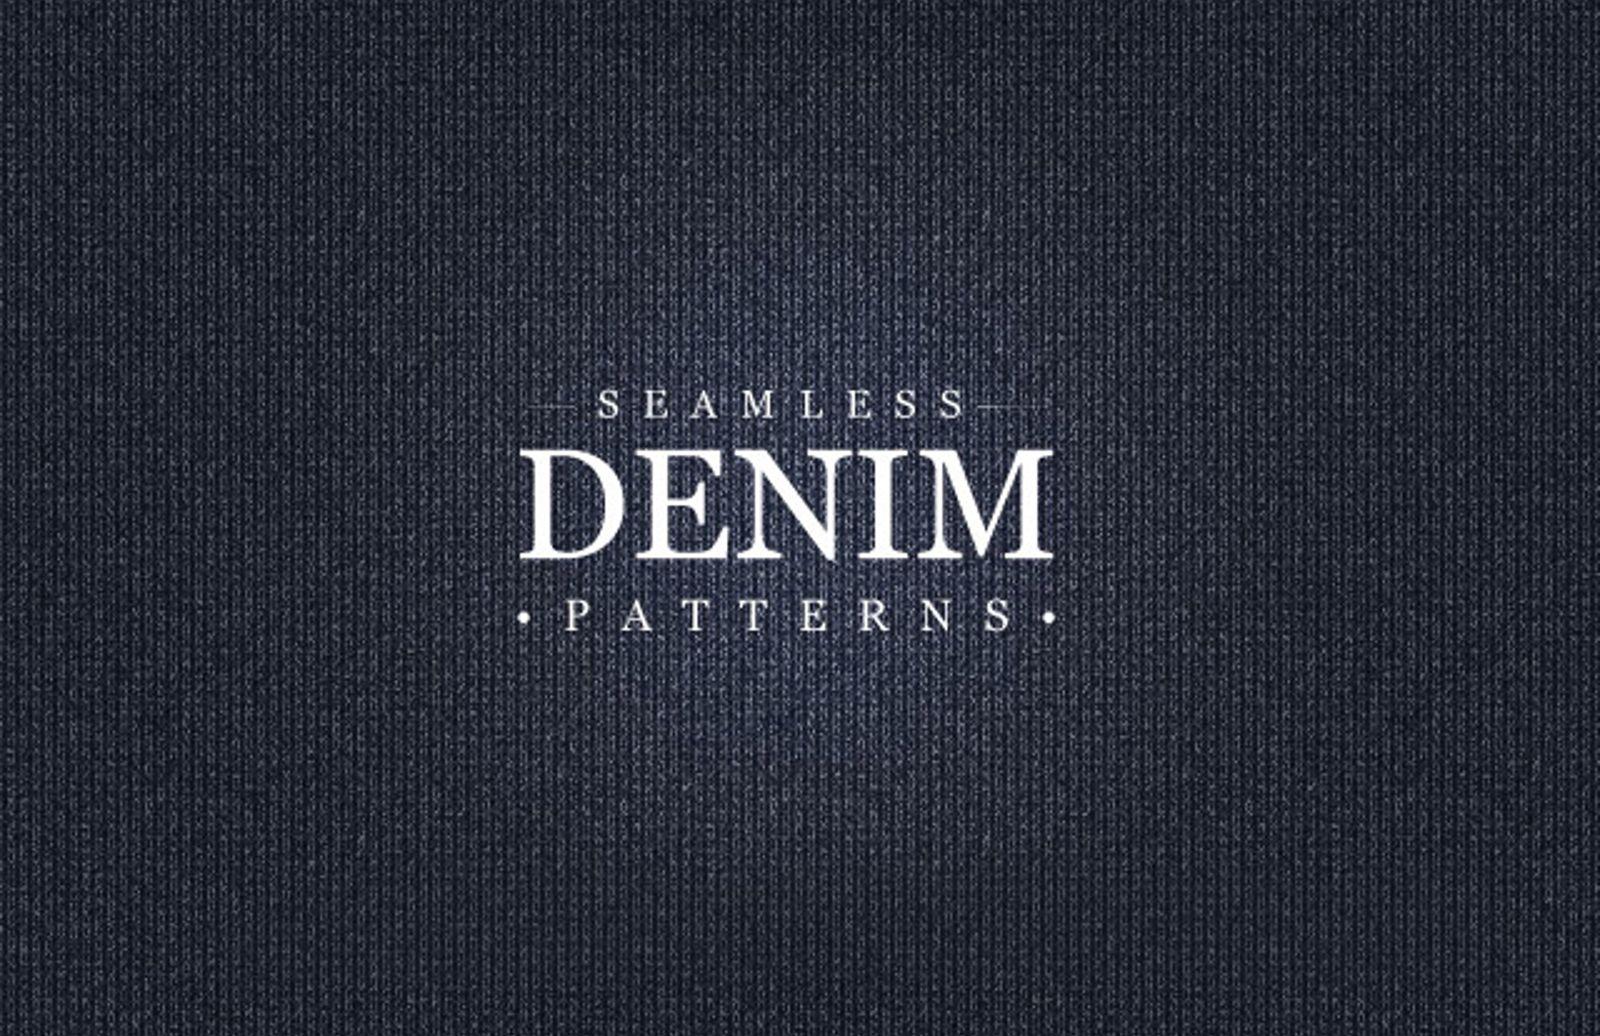 Seamless  Denim  Patterns  Preview1